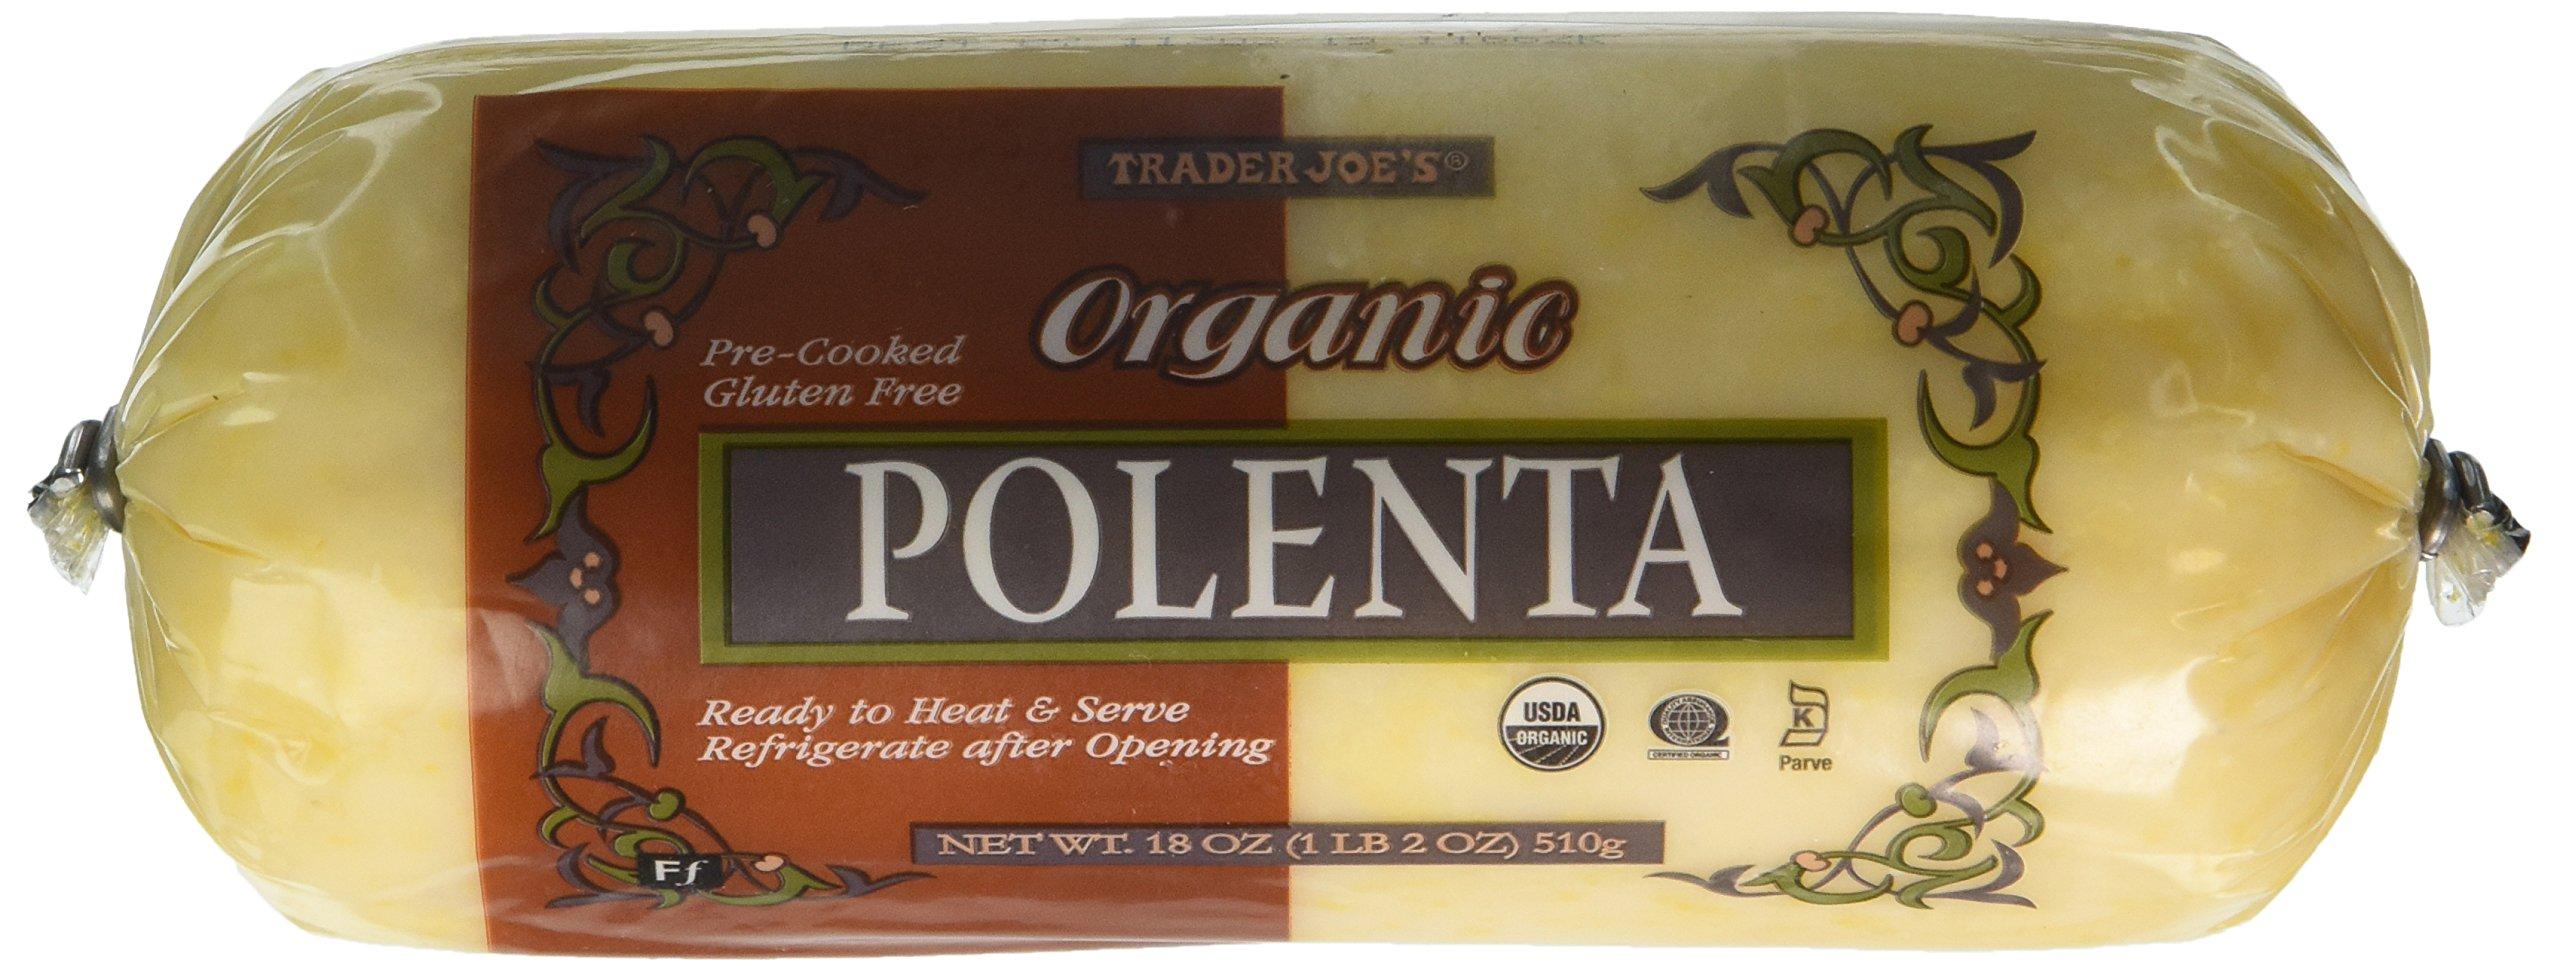 Trader Joe's Organic Polenta 18oz (1lb 2oz) 510g by Trader Joe's